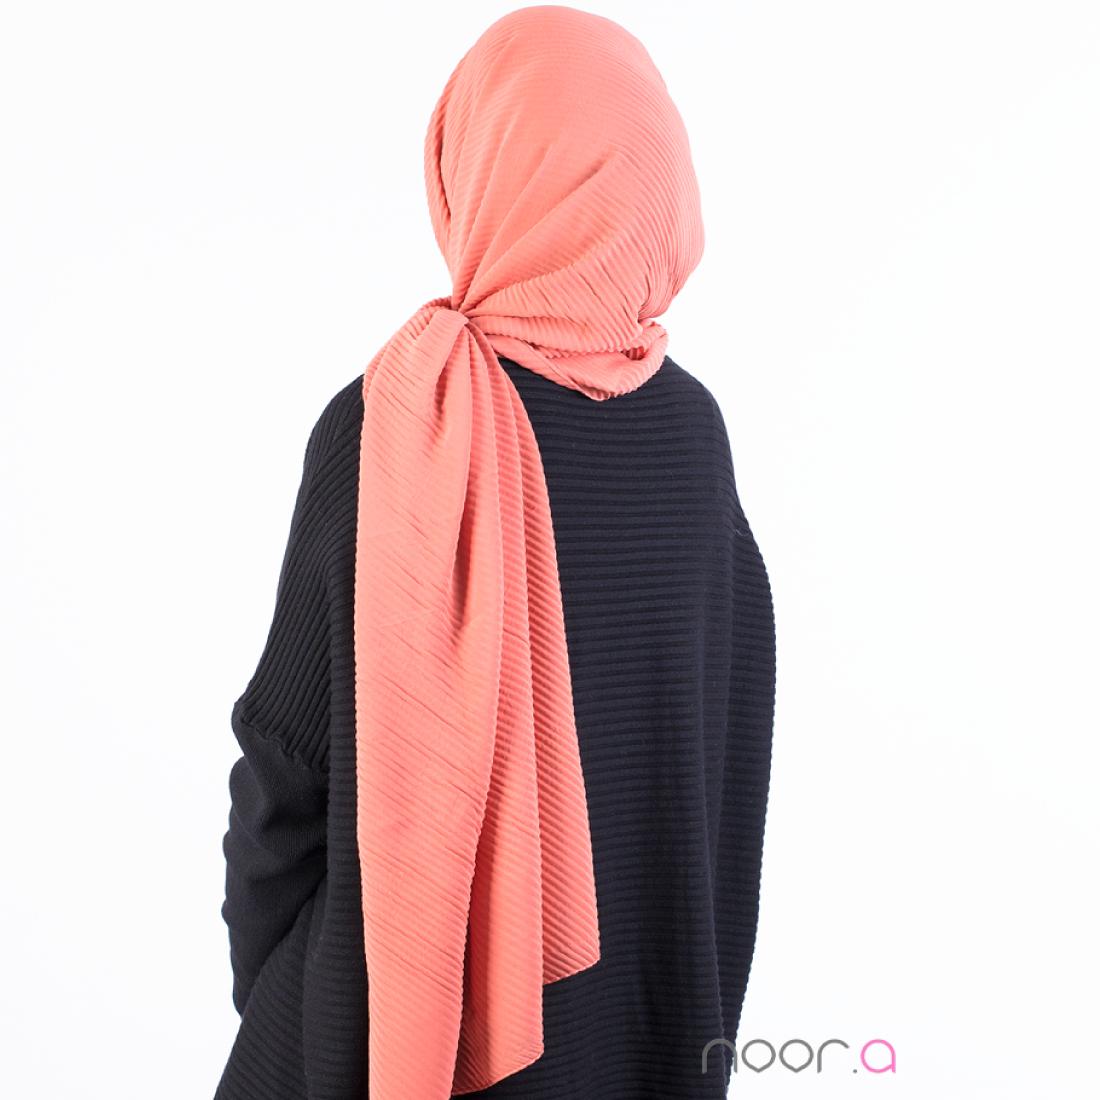 hijab_plisse_terracotta2